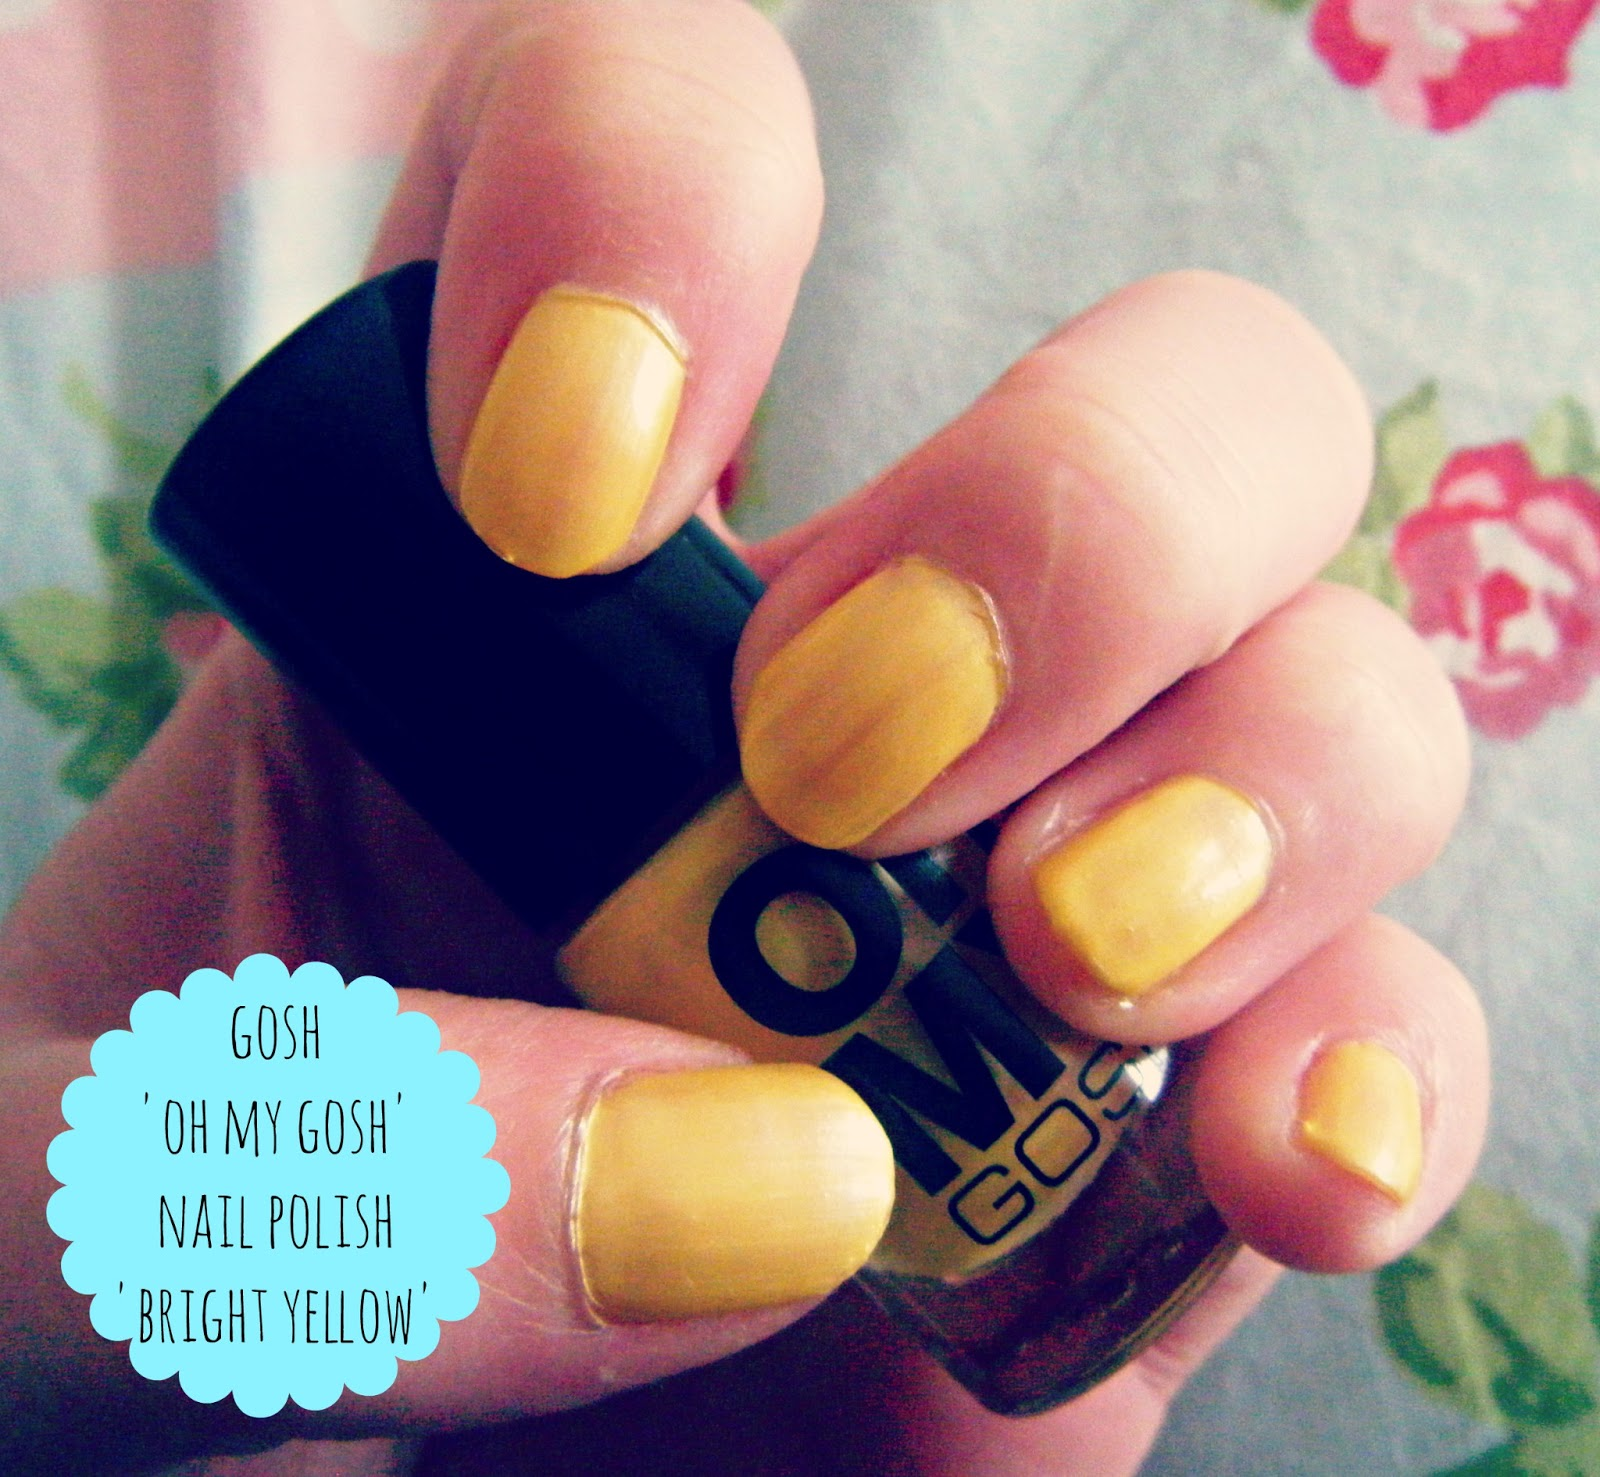 GOSH 'Oh My GOSH' Nail Polish In 'Bright Yellow